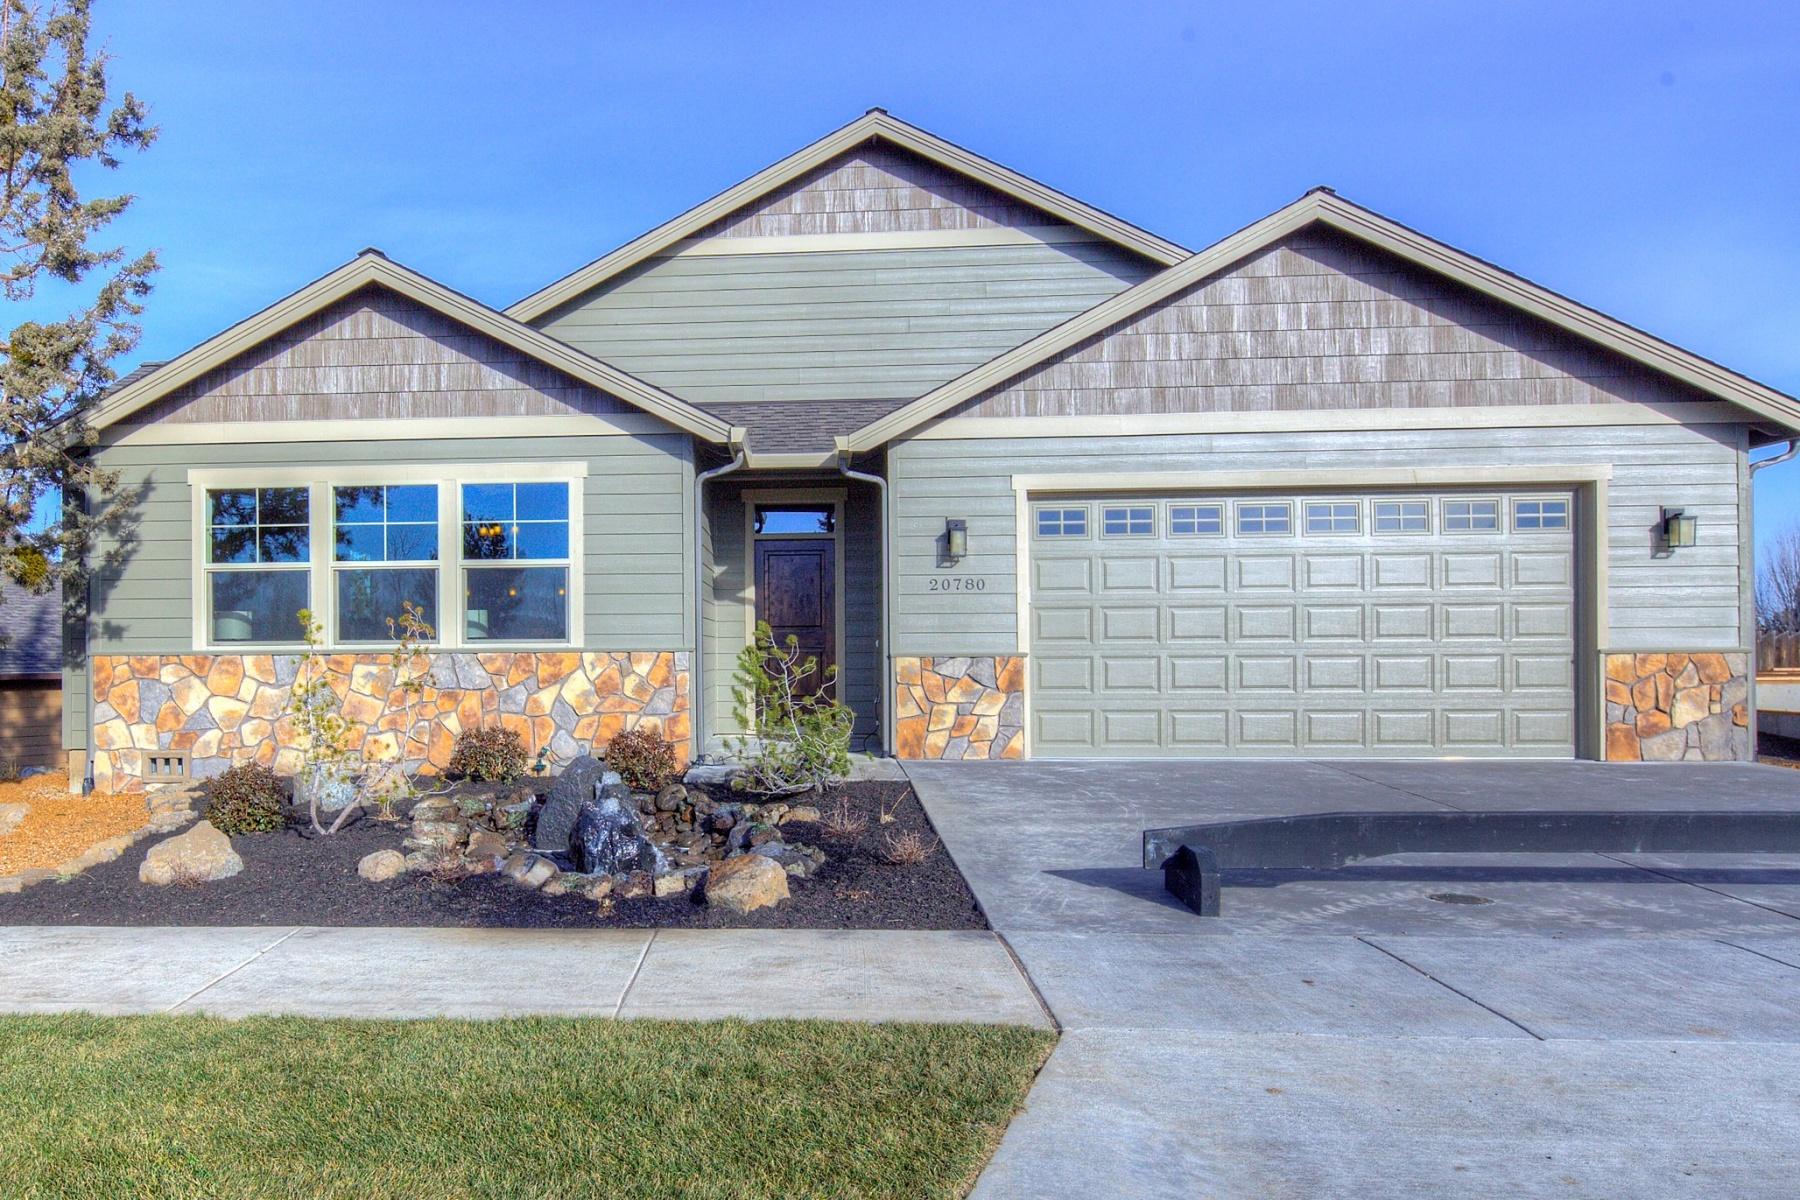 Casa Unifamiliar por un Venta en Horizon Ridge 20784 Horizon Ridge Pl Bend, Oregon 97701 Estados Unidos